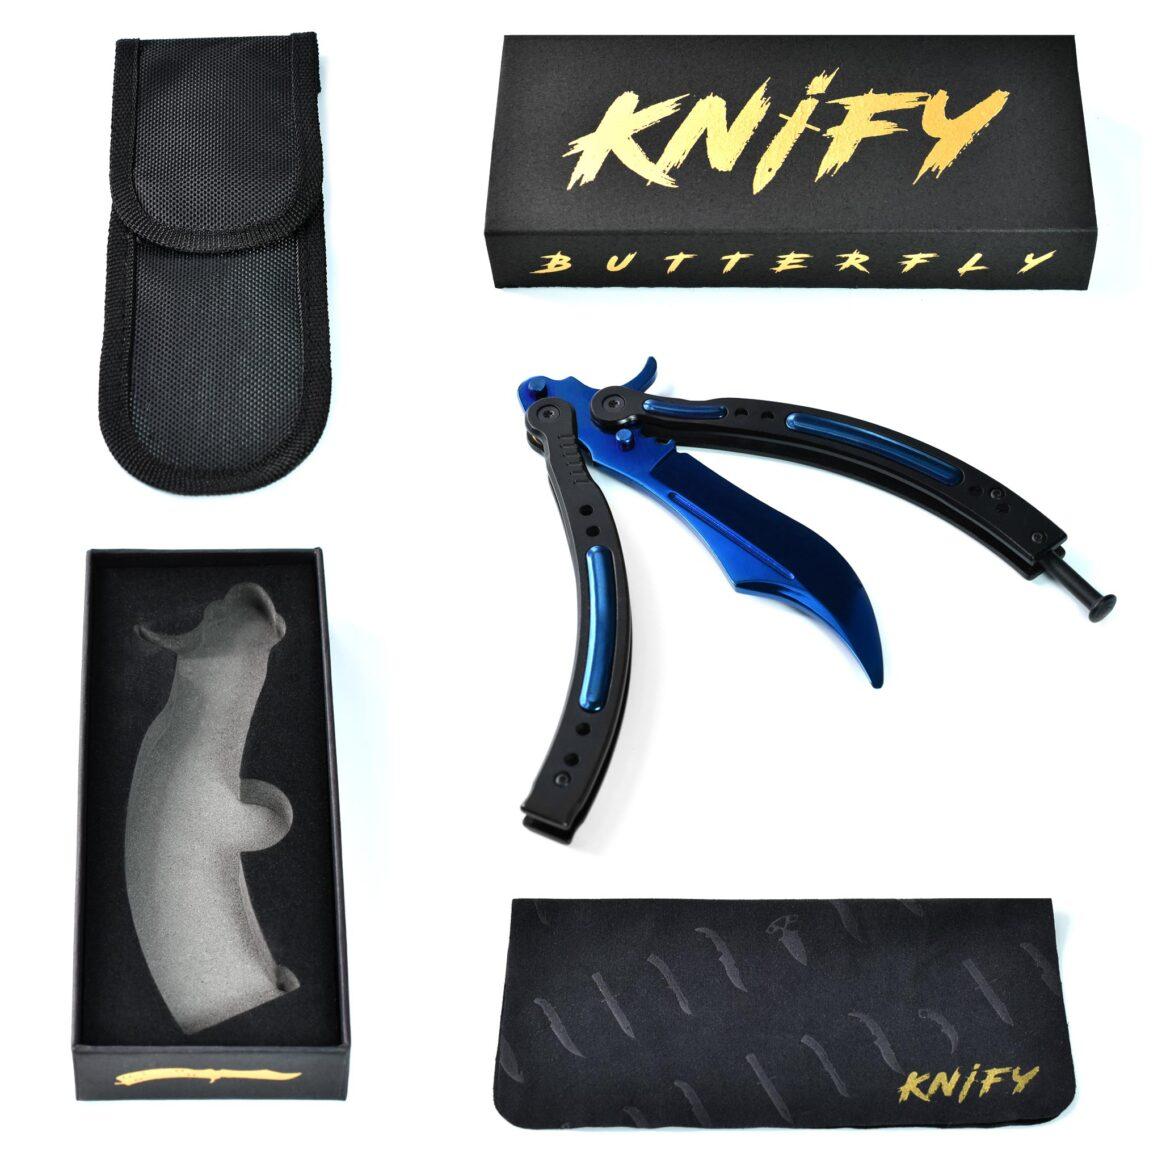 Real CS:GO Butterfly Blue Steel - IRL CS GO Knife